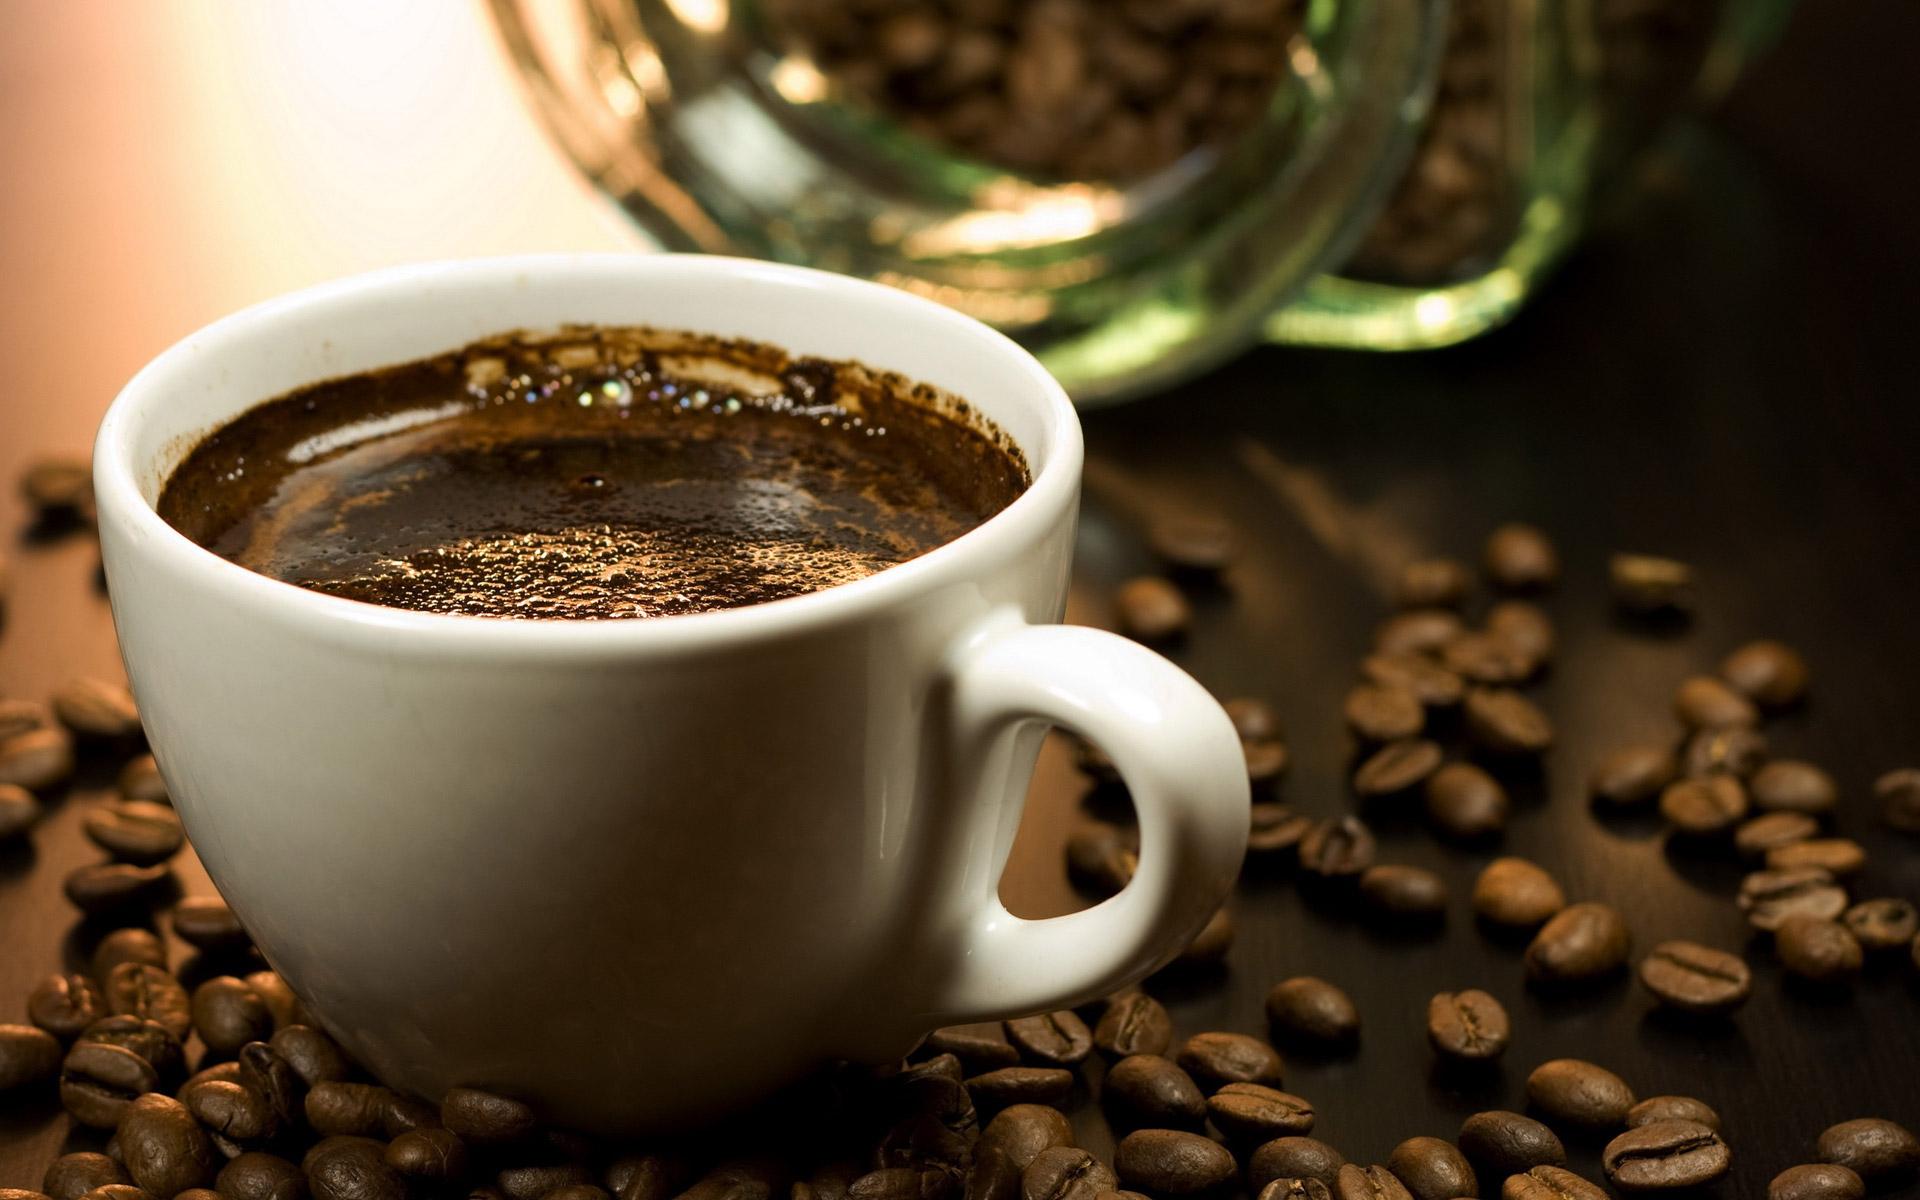 چربی سوزی با قهوه | لاغری با قهوه